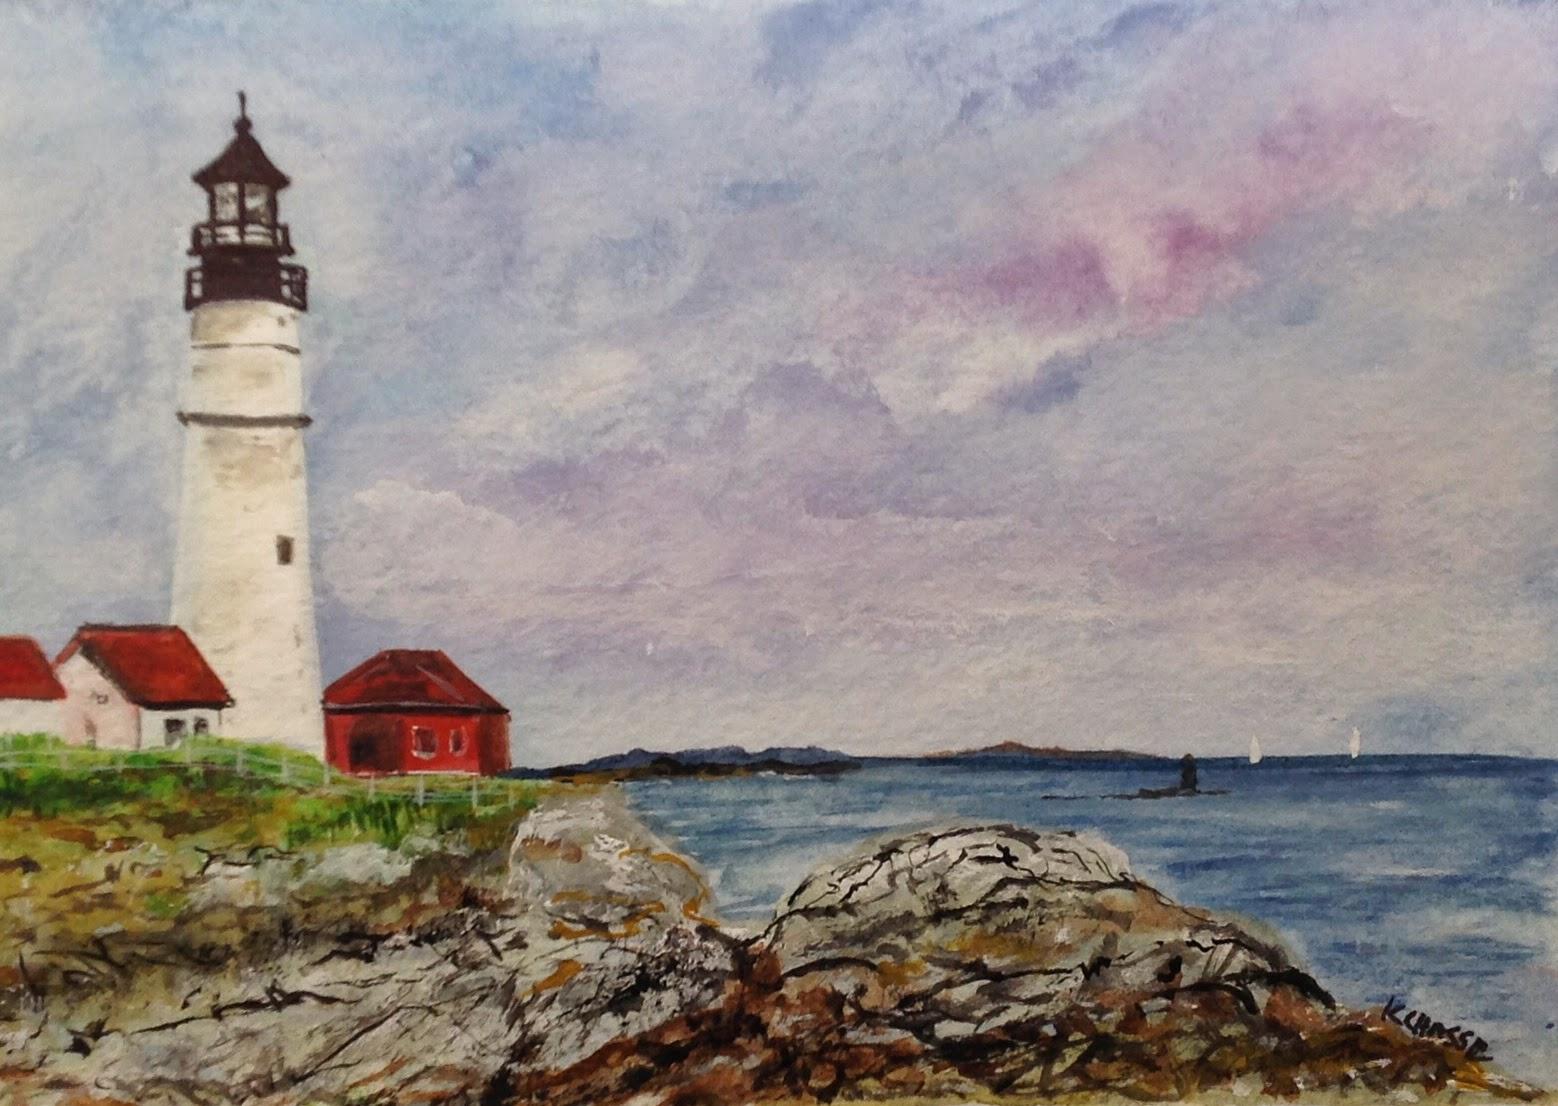 Portland Head Light - Lighthouse